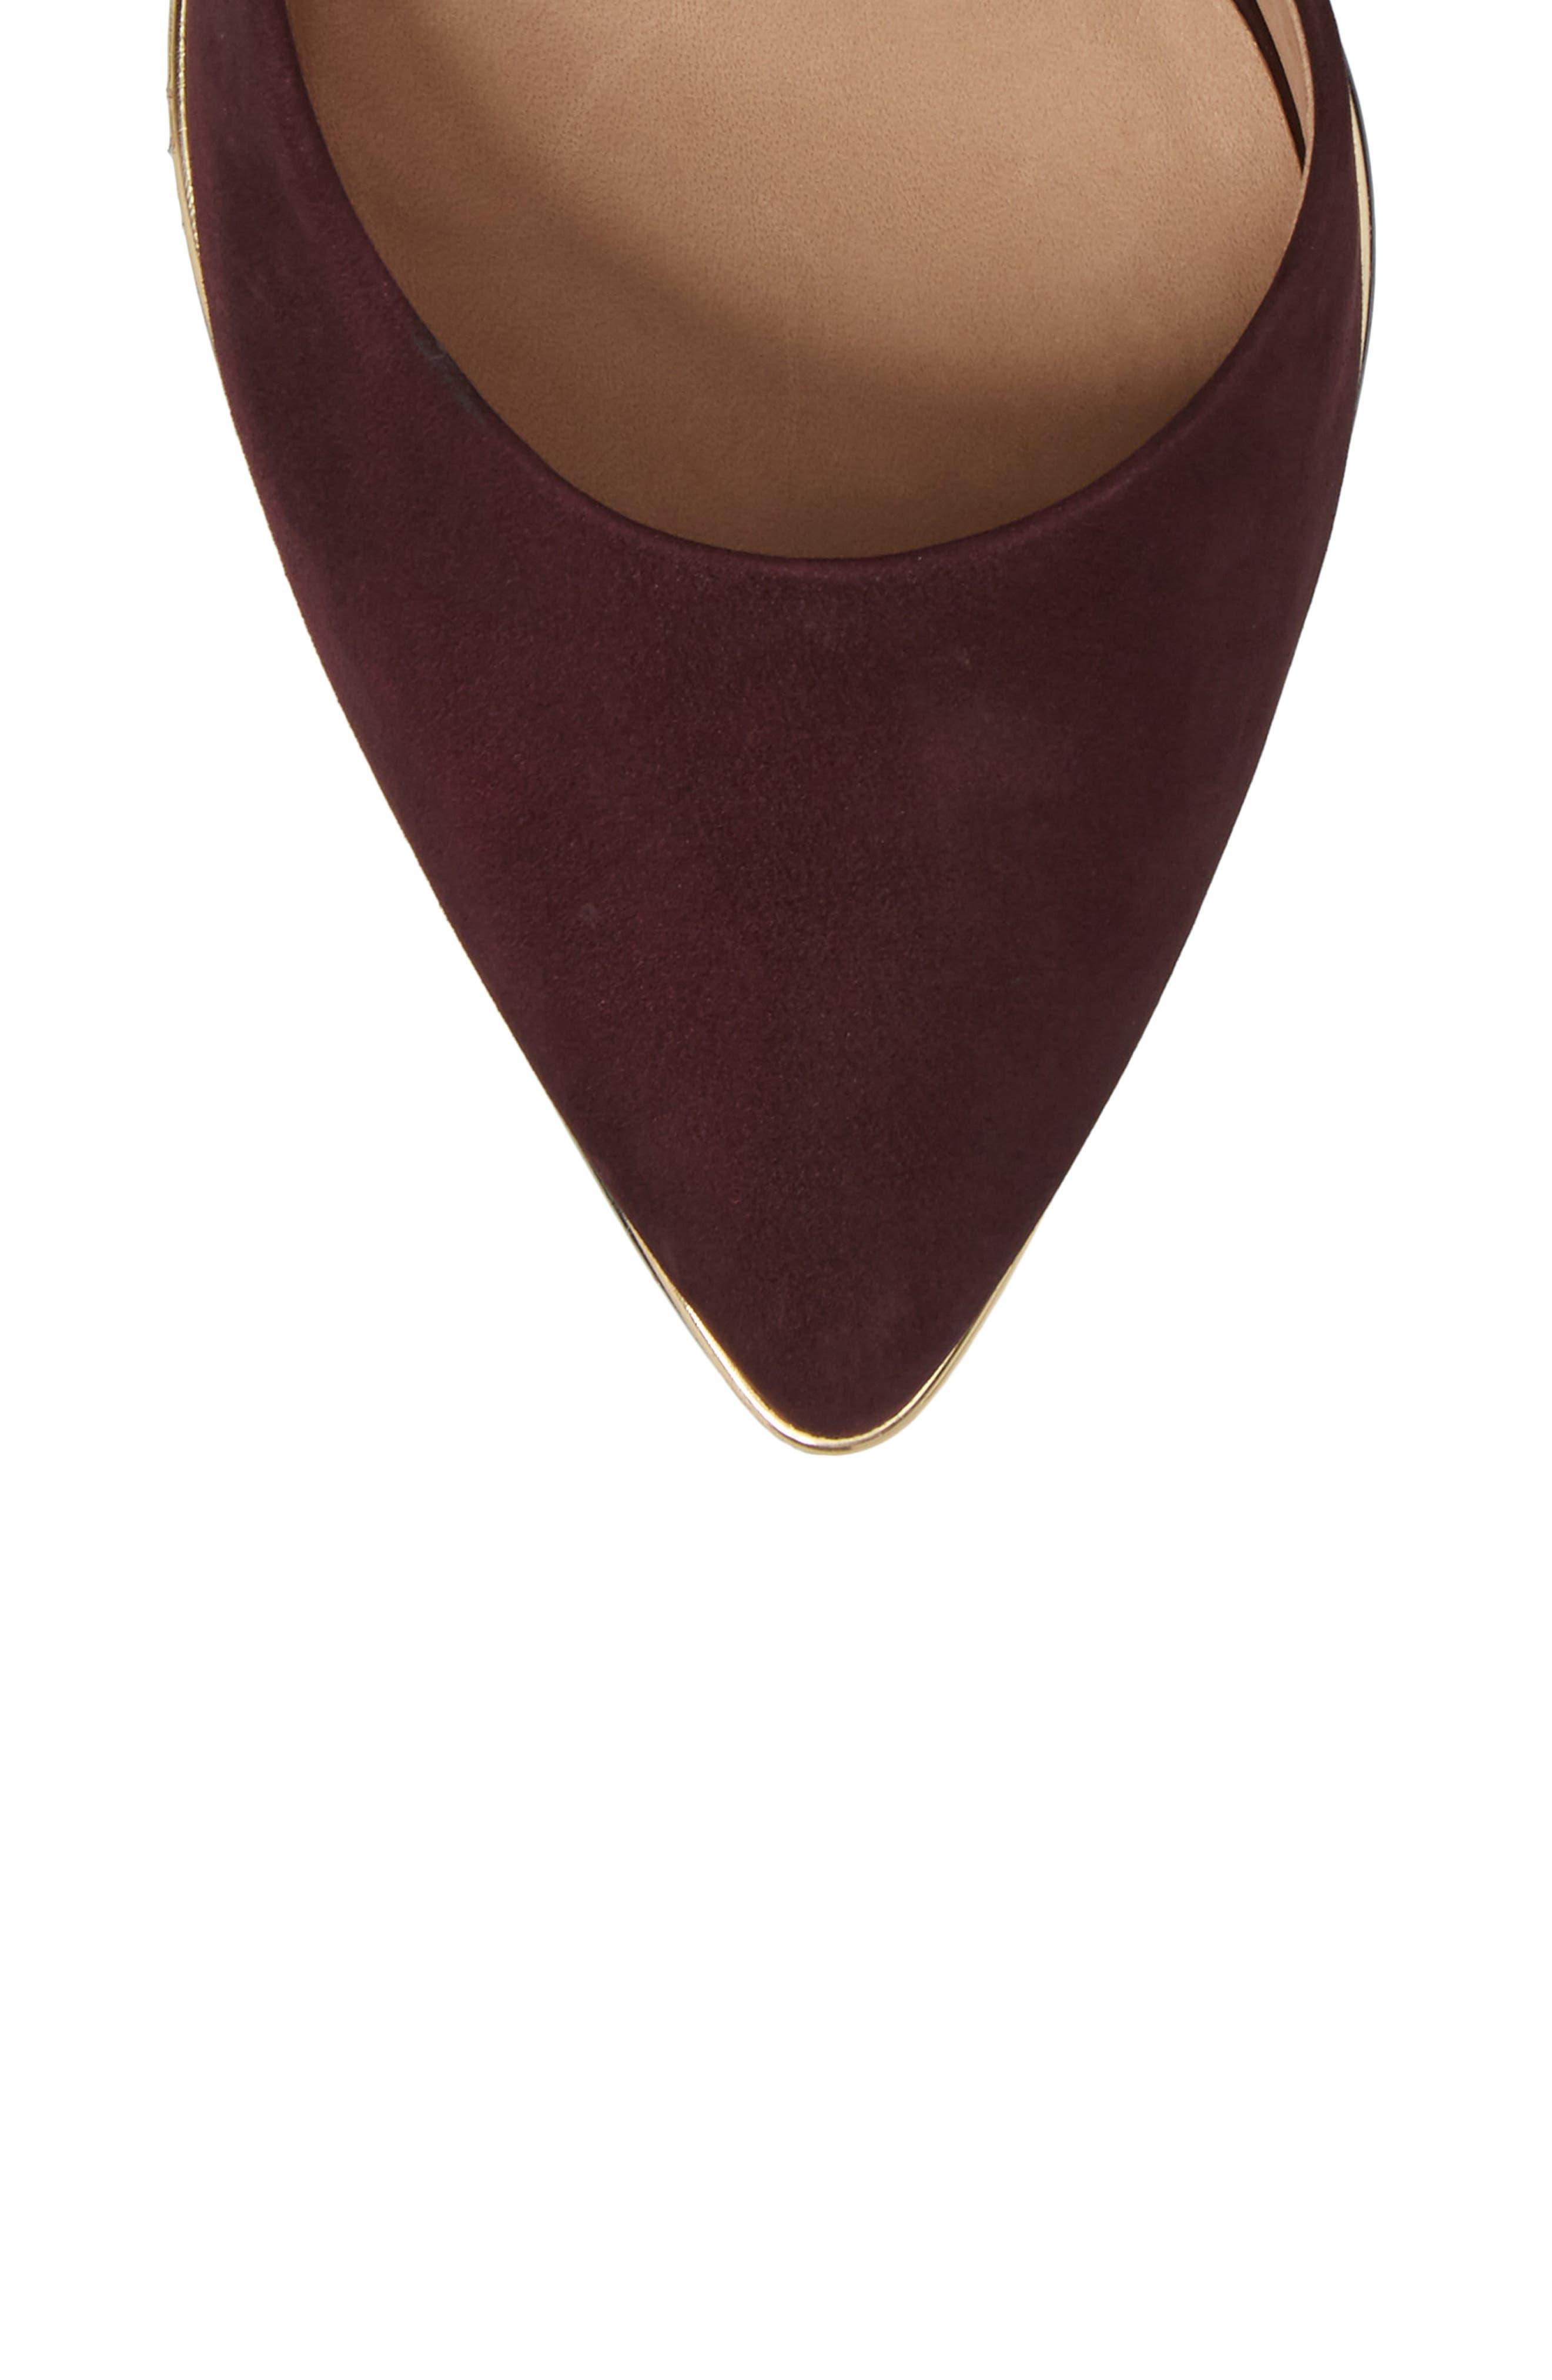 Rimona Pump,                             Alternate thumbnail 5, color,                             Wine Nubuck Leather